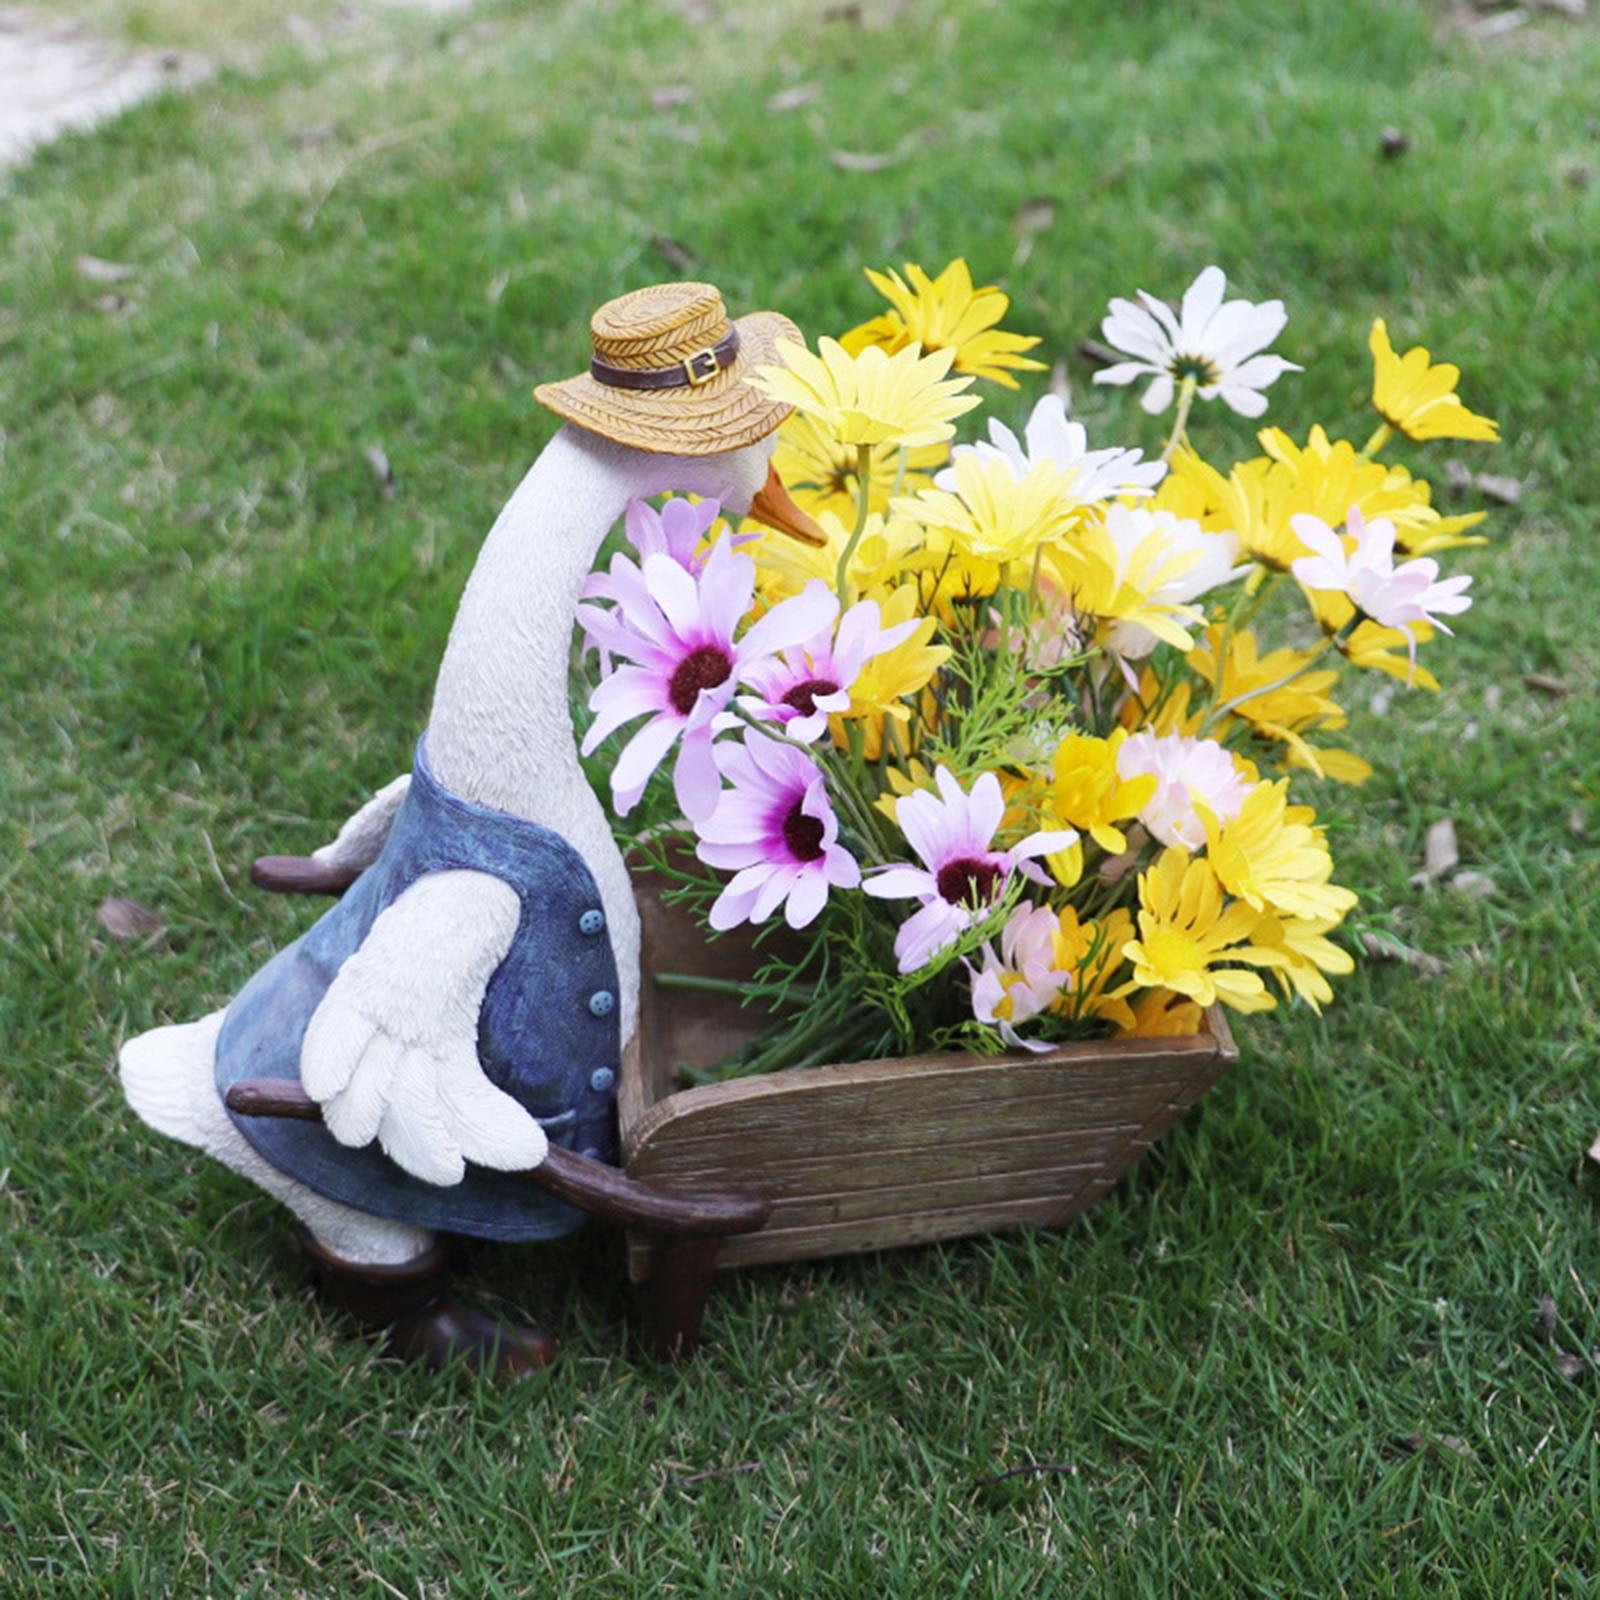 Duck Flower Planter Pot Fairy Garden Landscape Plants Flower Vase Container Resin Statue Flowerpot Living Room Decor